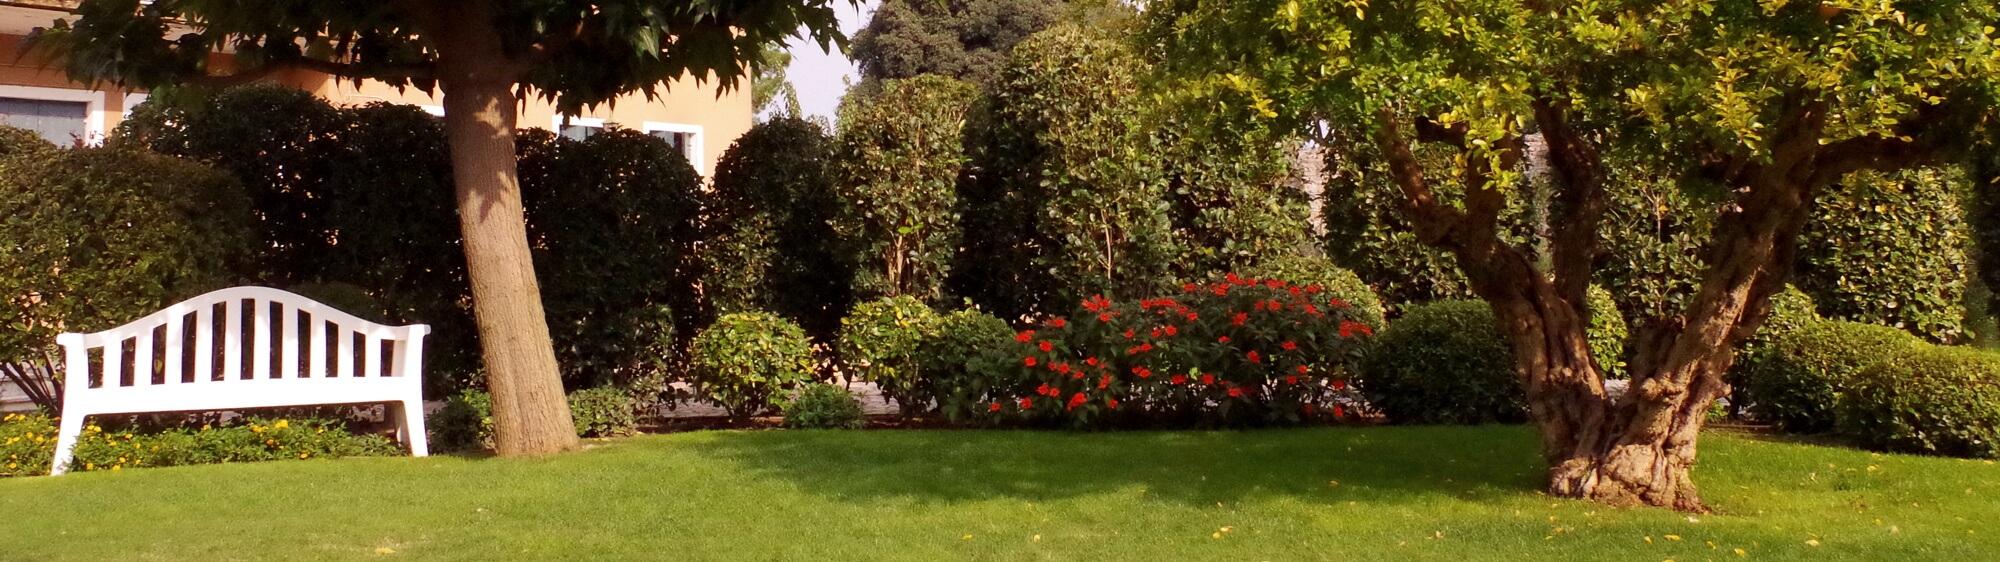 Venice Secret Garden - Brunella in Venice